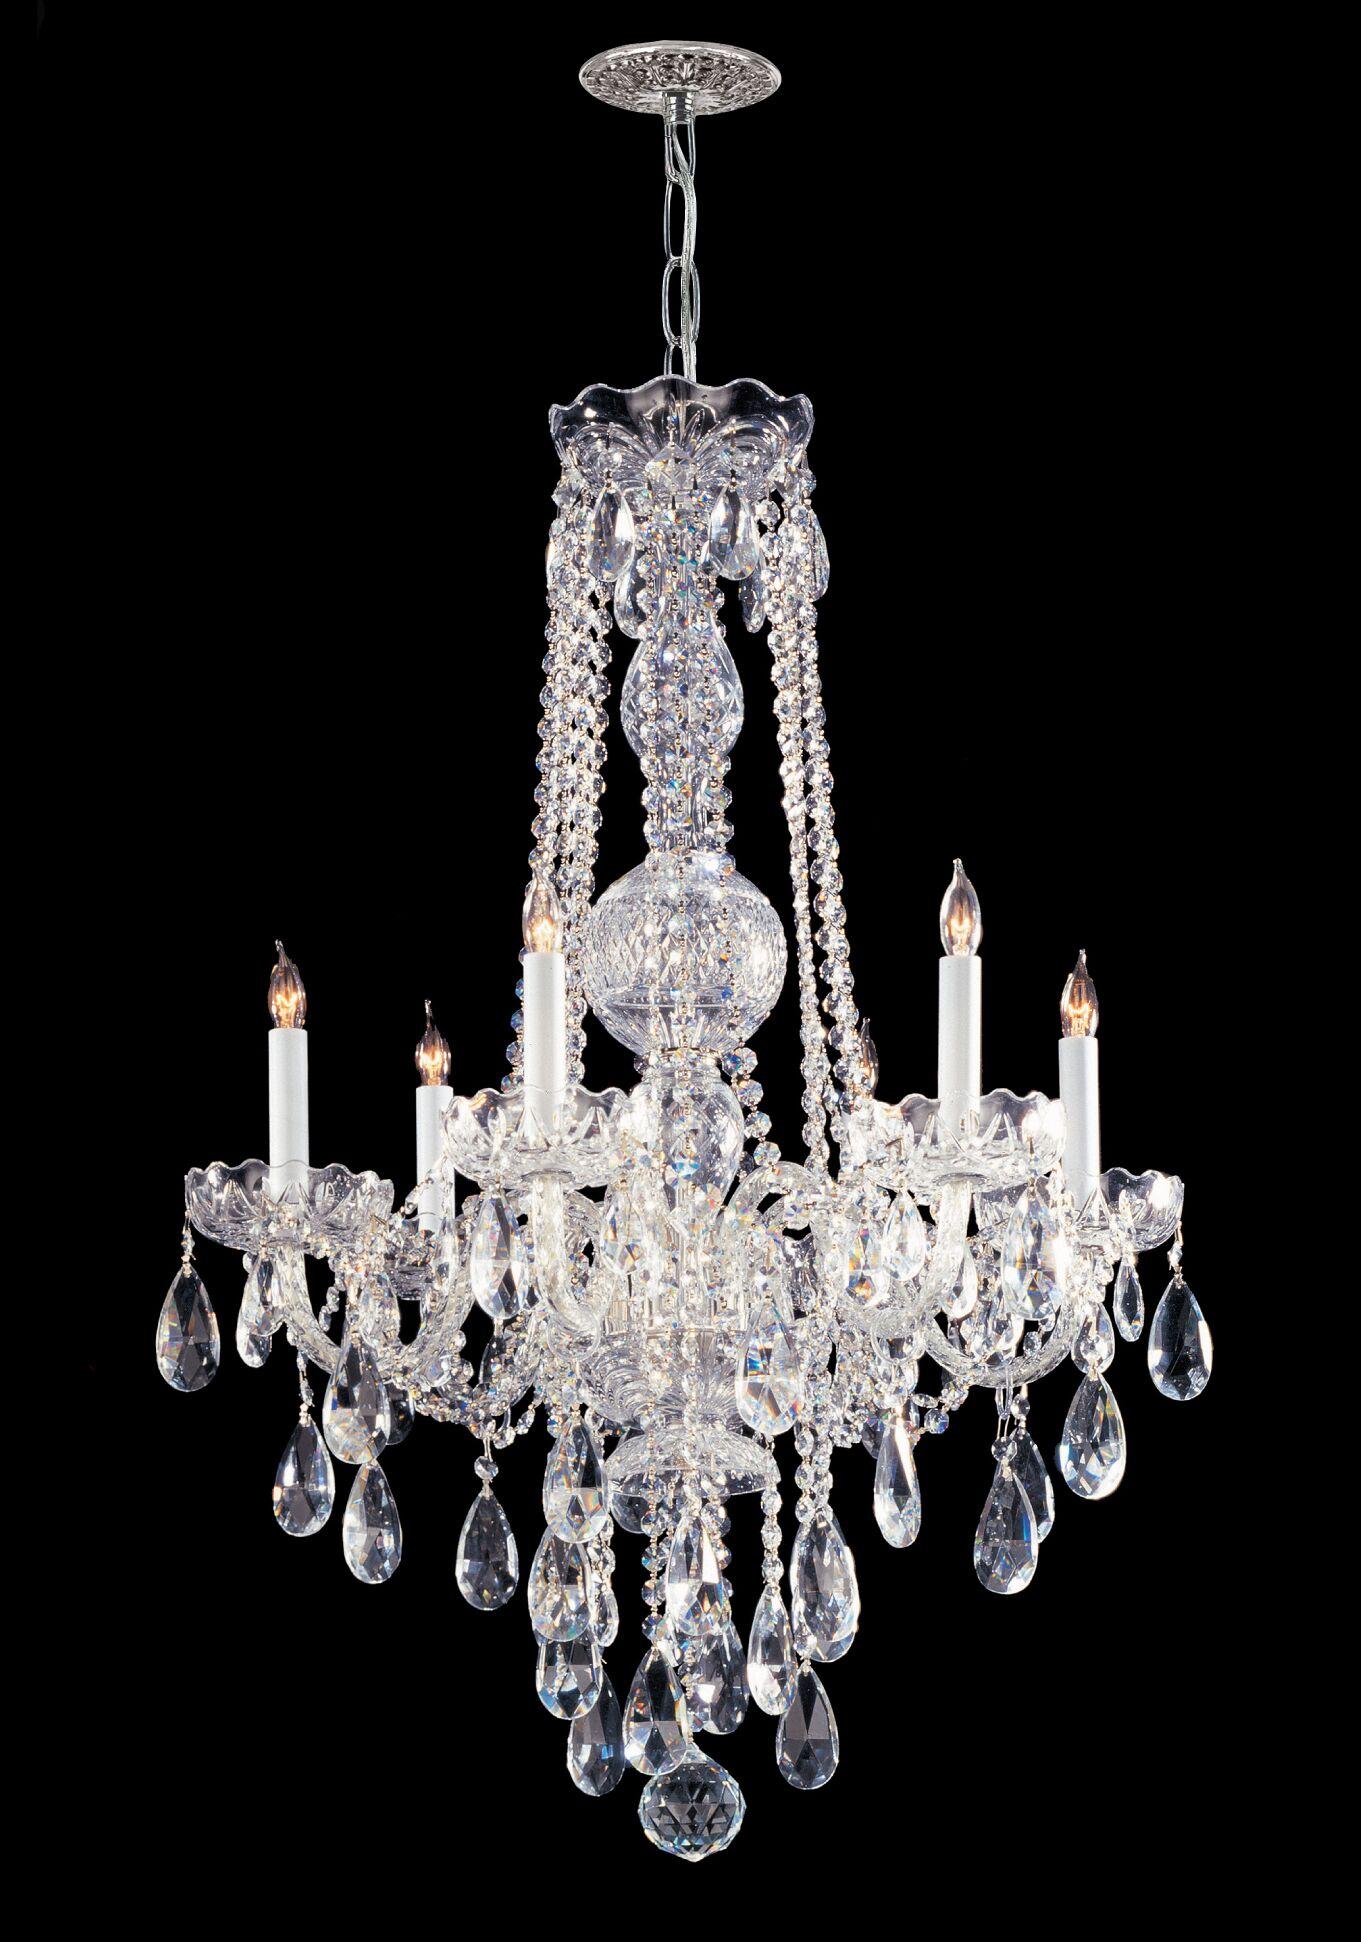 Careen 6-Light Candle Style Chandelier Crystal Type: Swarovski Strass, Finish: Polished Chrome